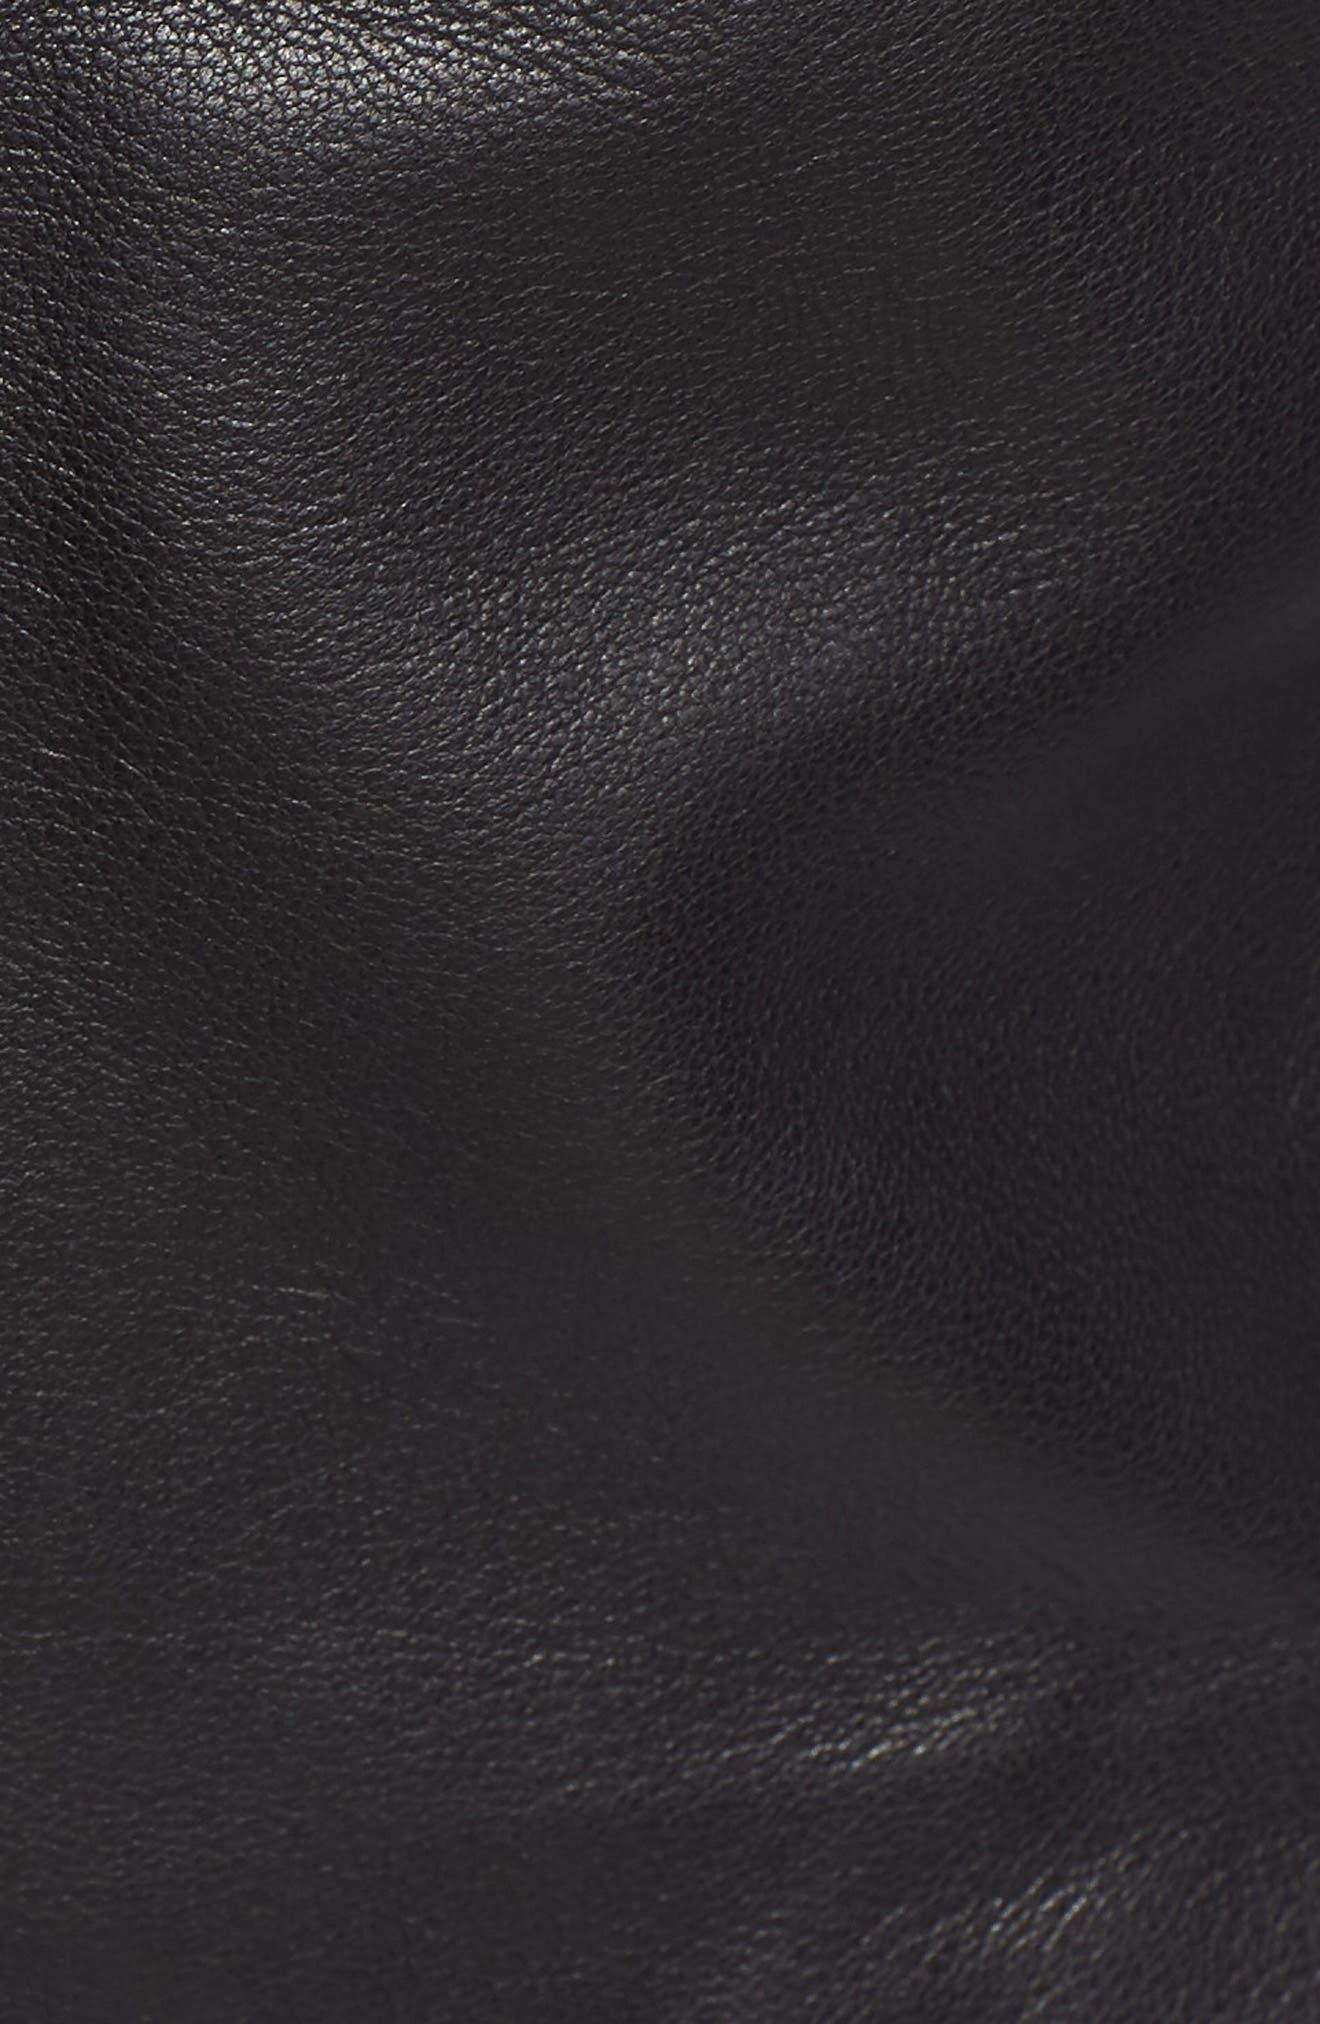 Flutter Sleeve Leather Bustier,                             Alternate thumbnail 6, color,                             001